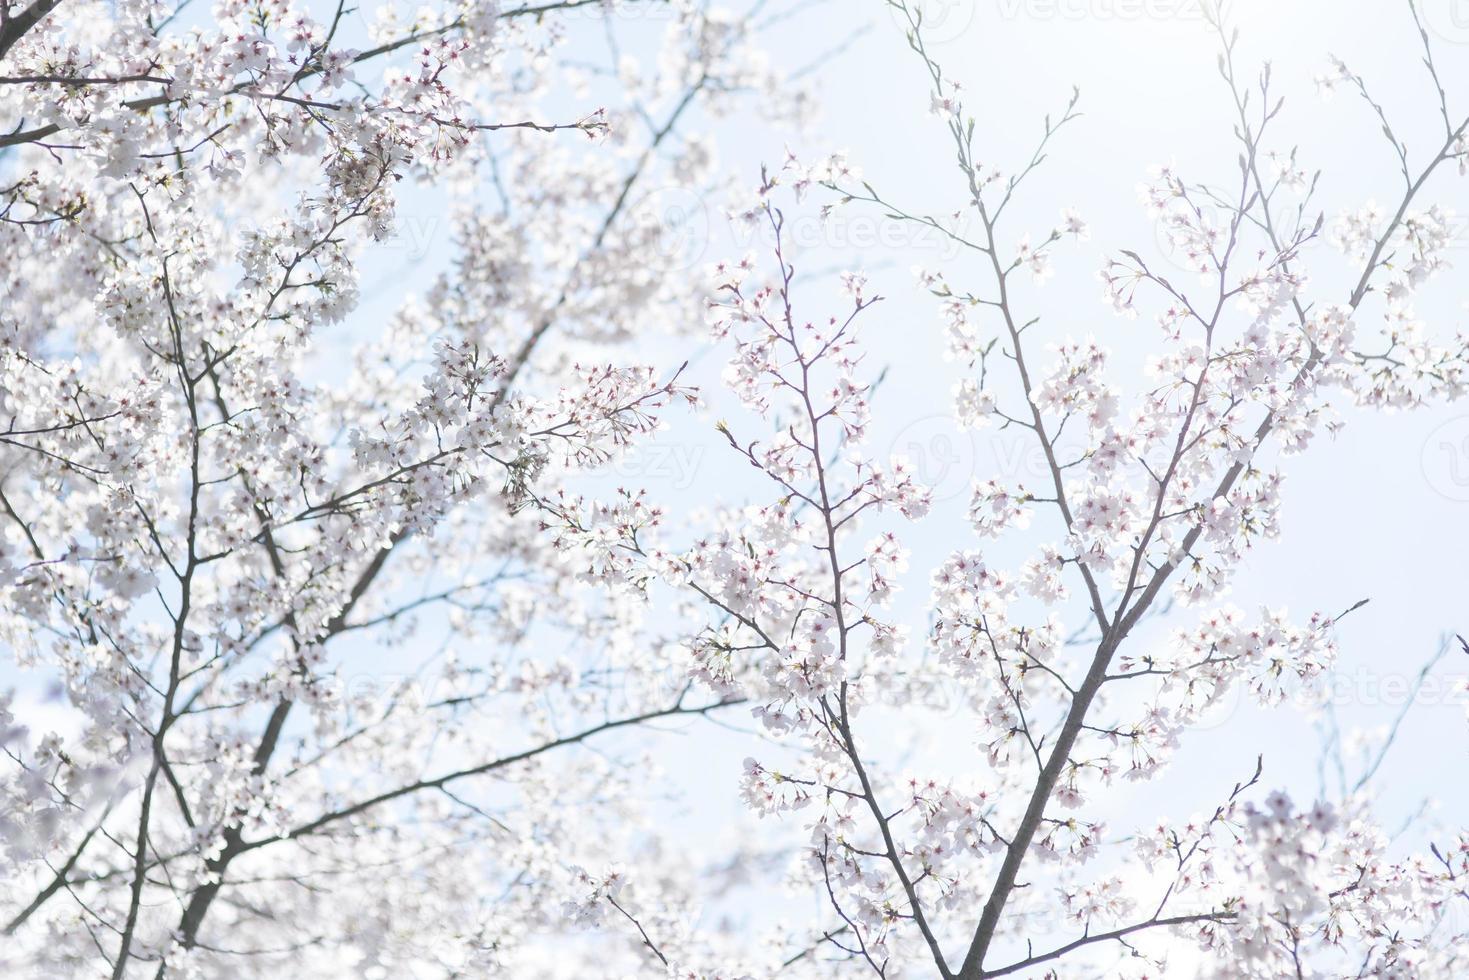 Cherry blossom Image photo